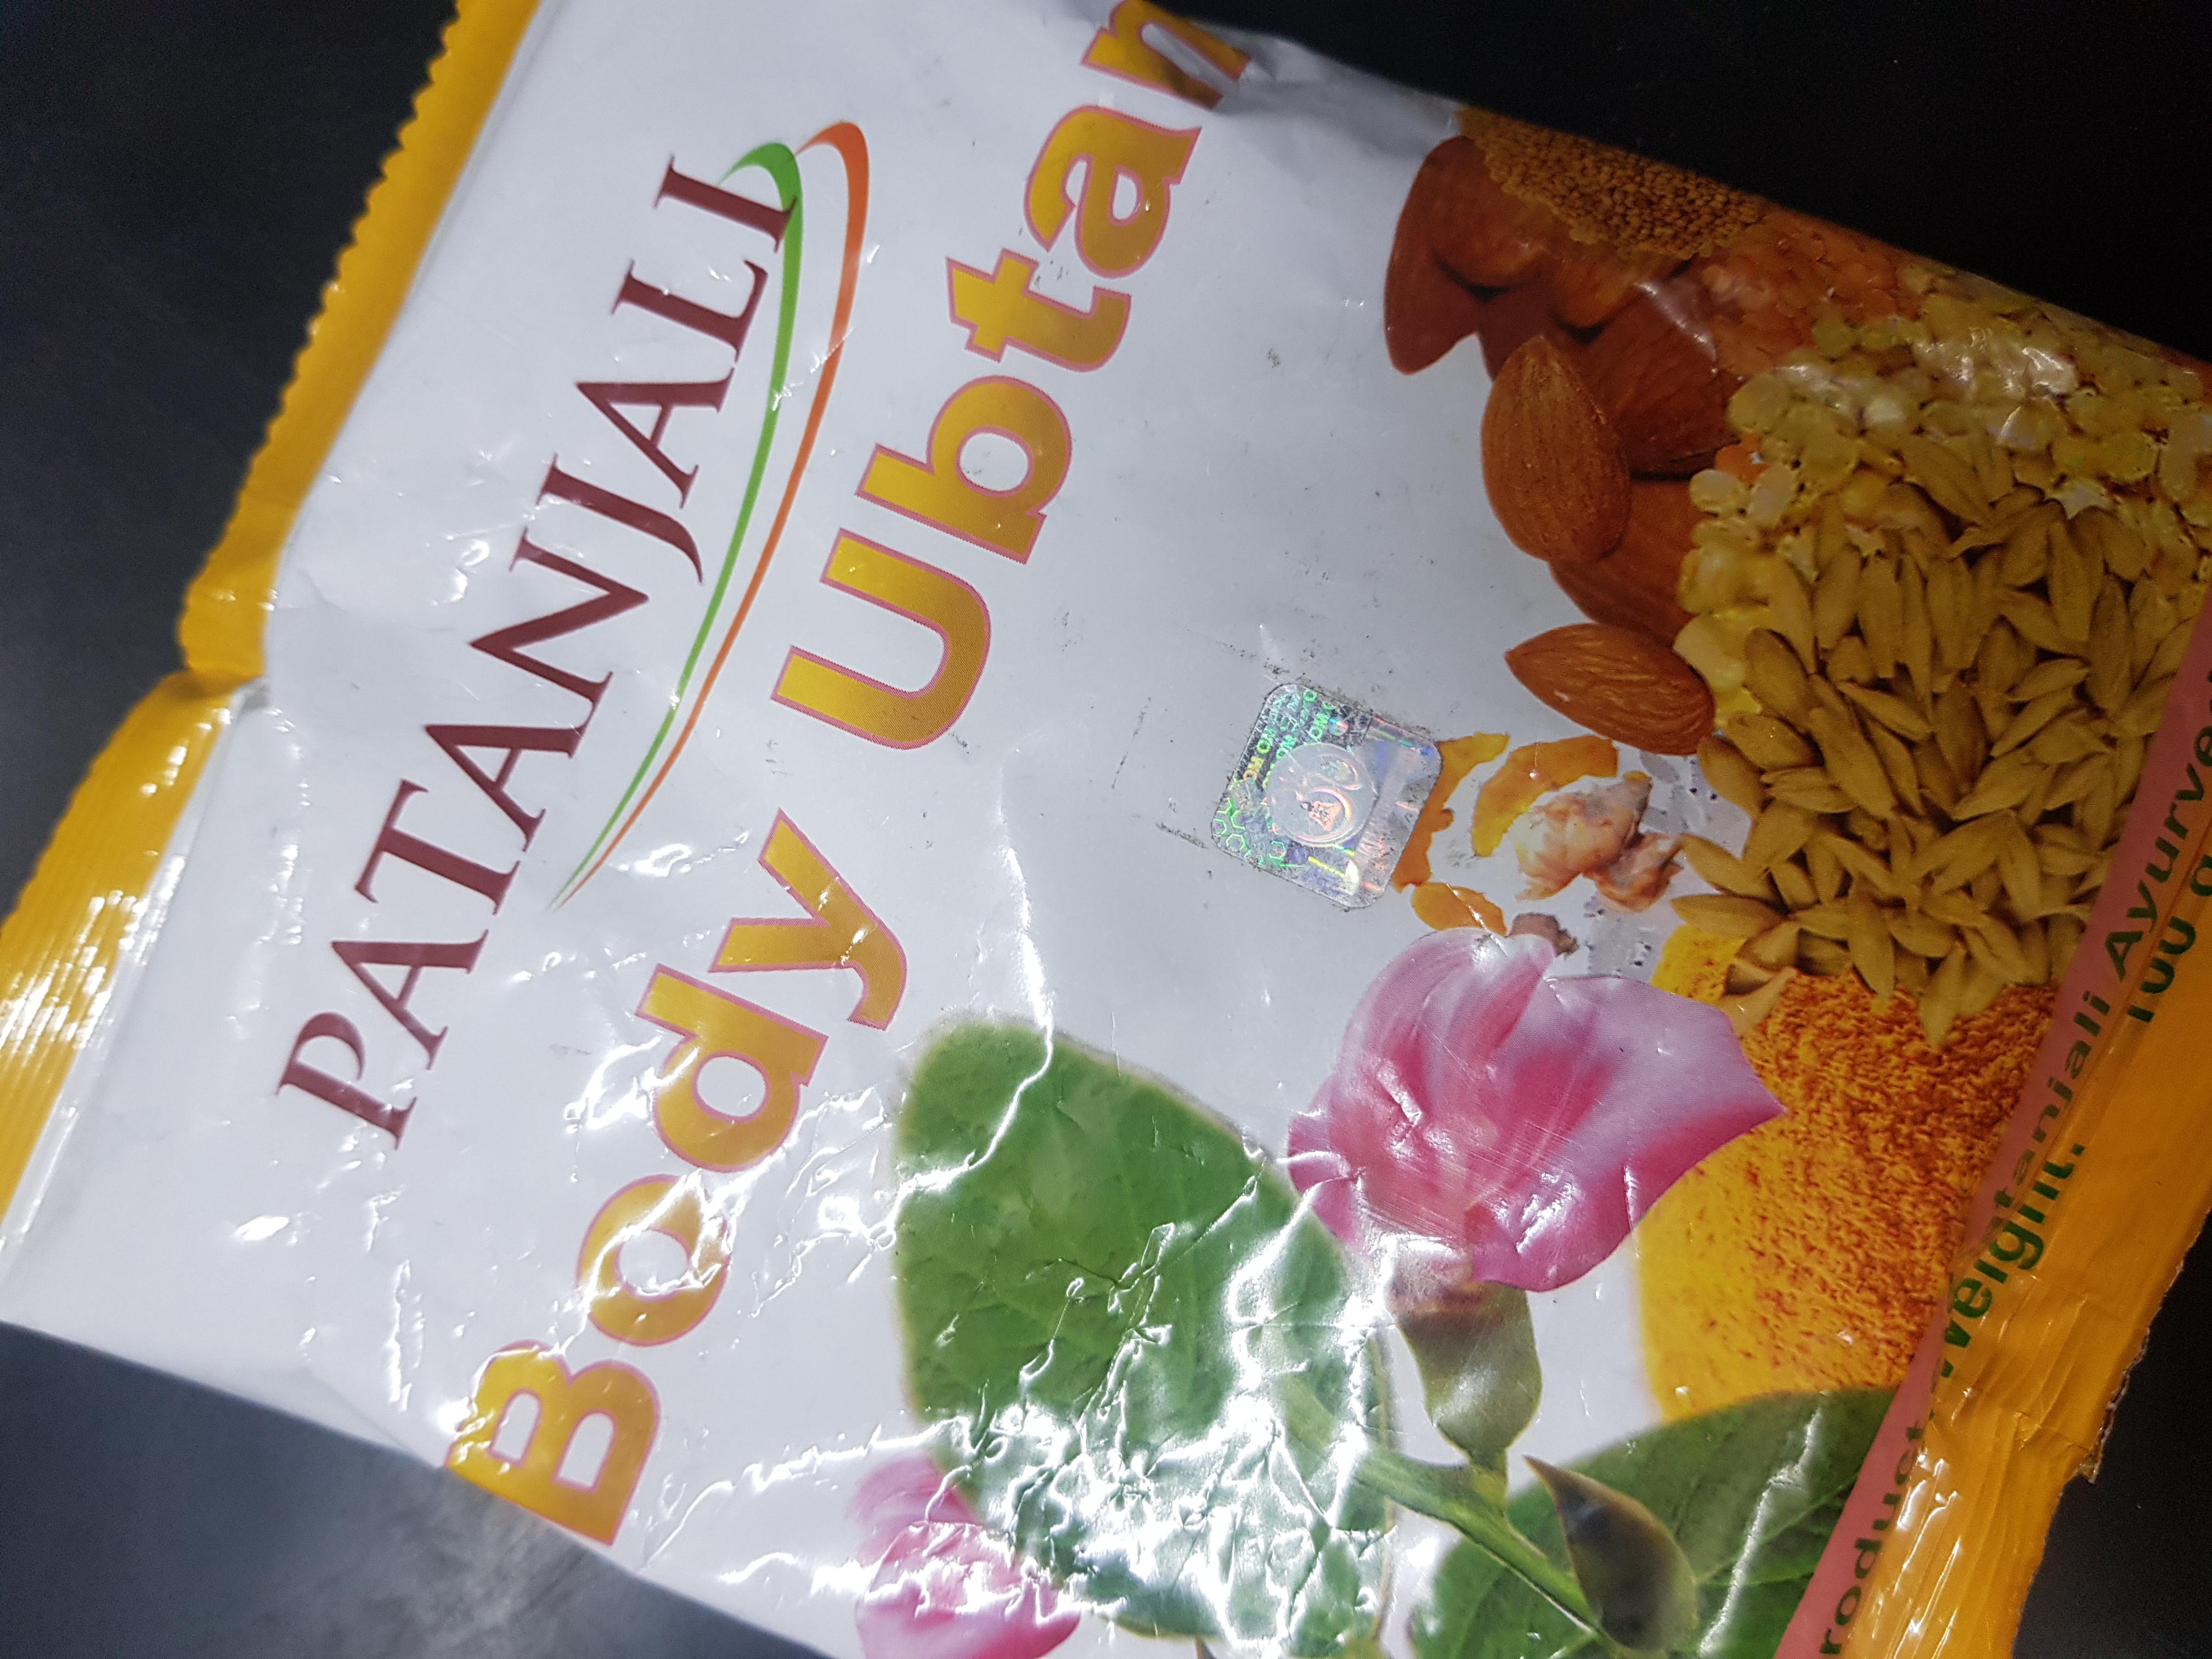 Patanjali Body Ubtan-Body ubtan!-By poonam_kakkar